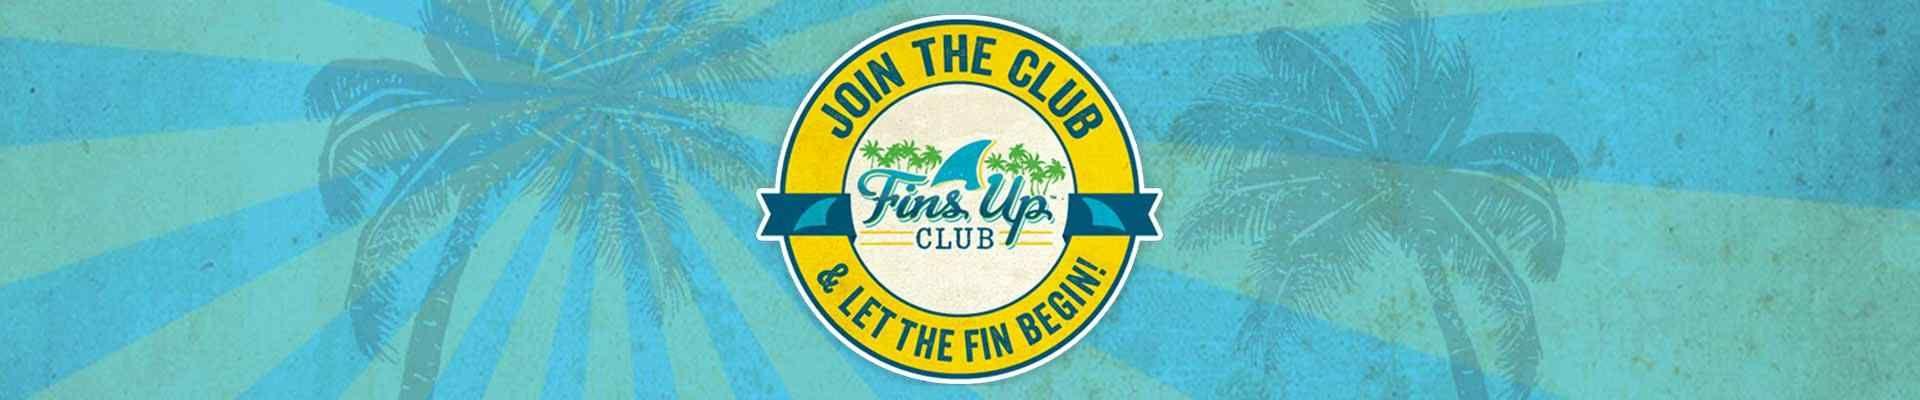 Fins Up Club